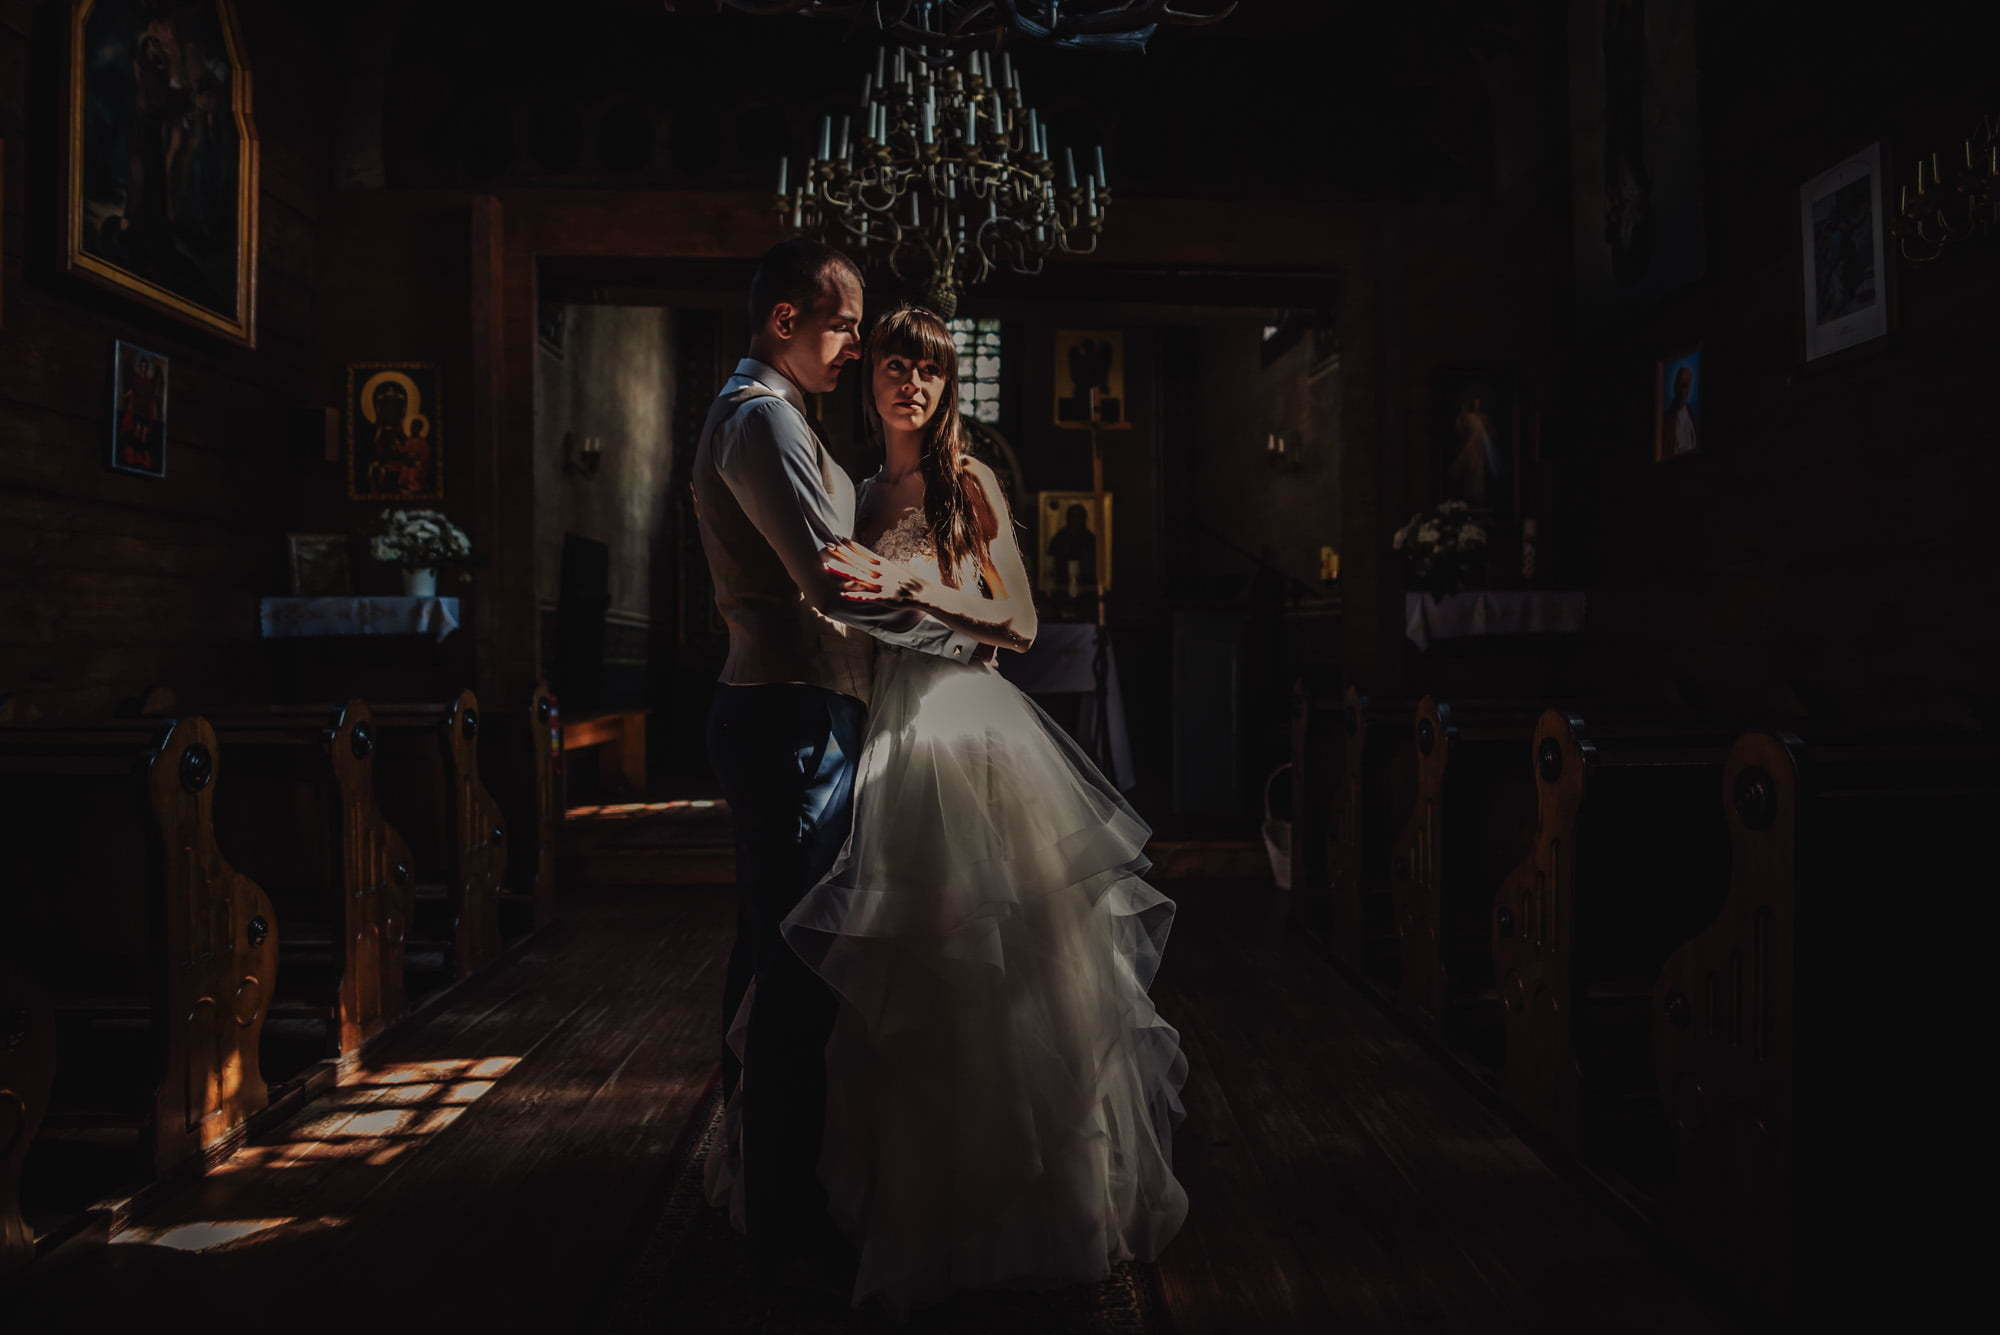 wedding photographer Europe - Felix de Vega